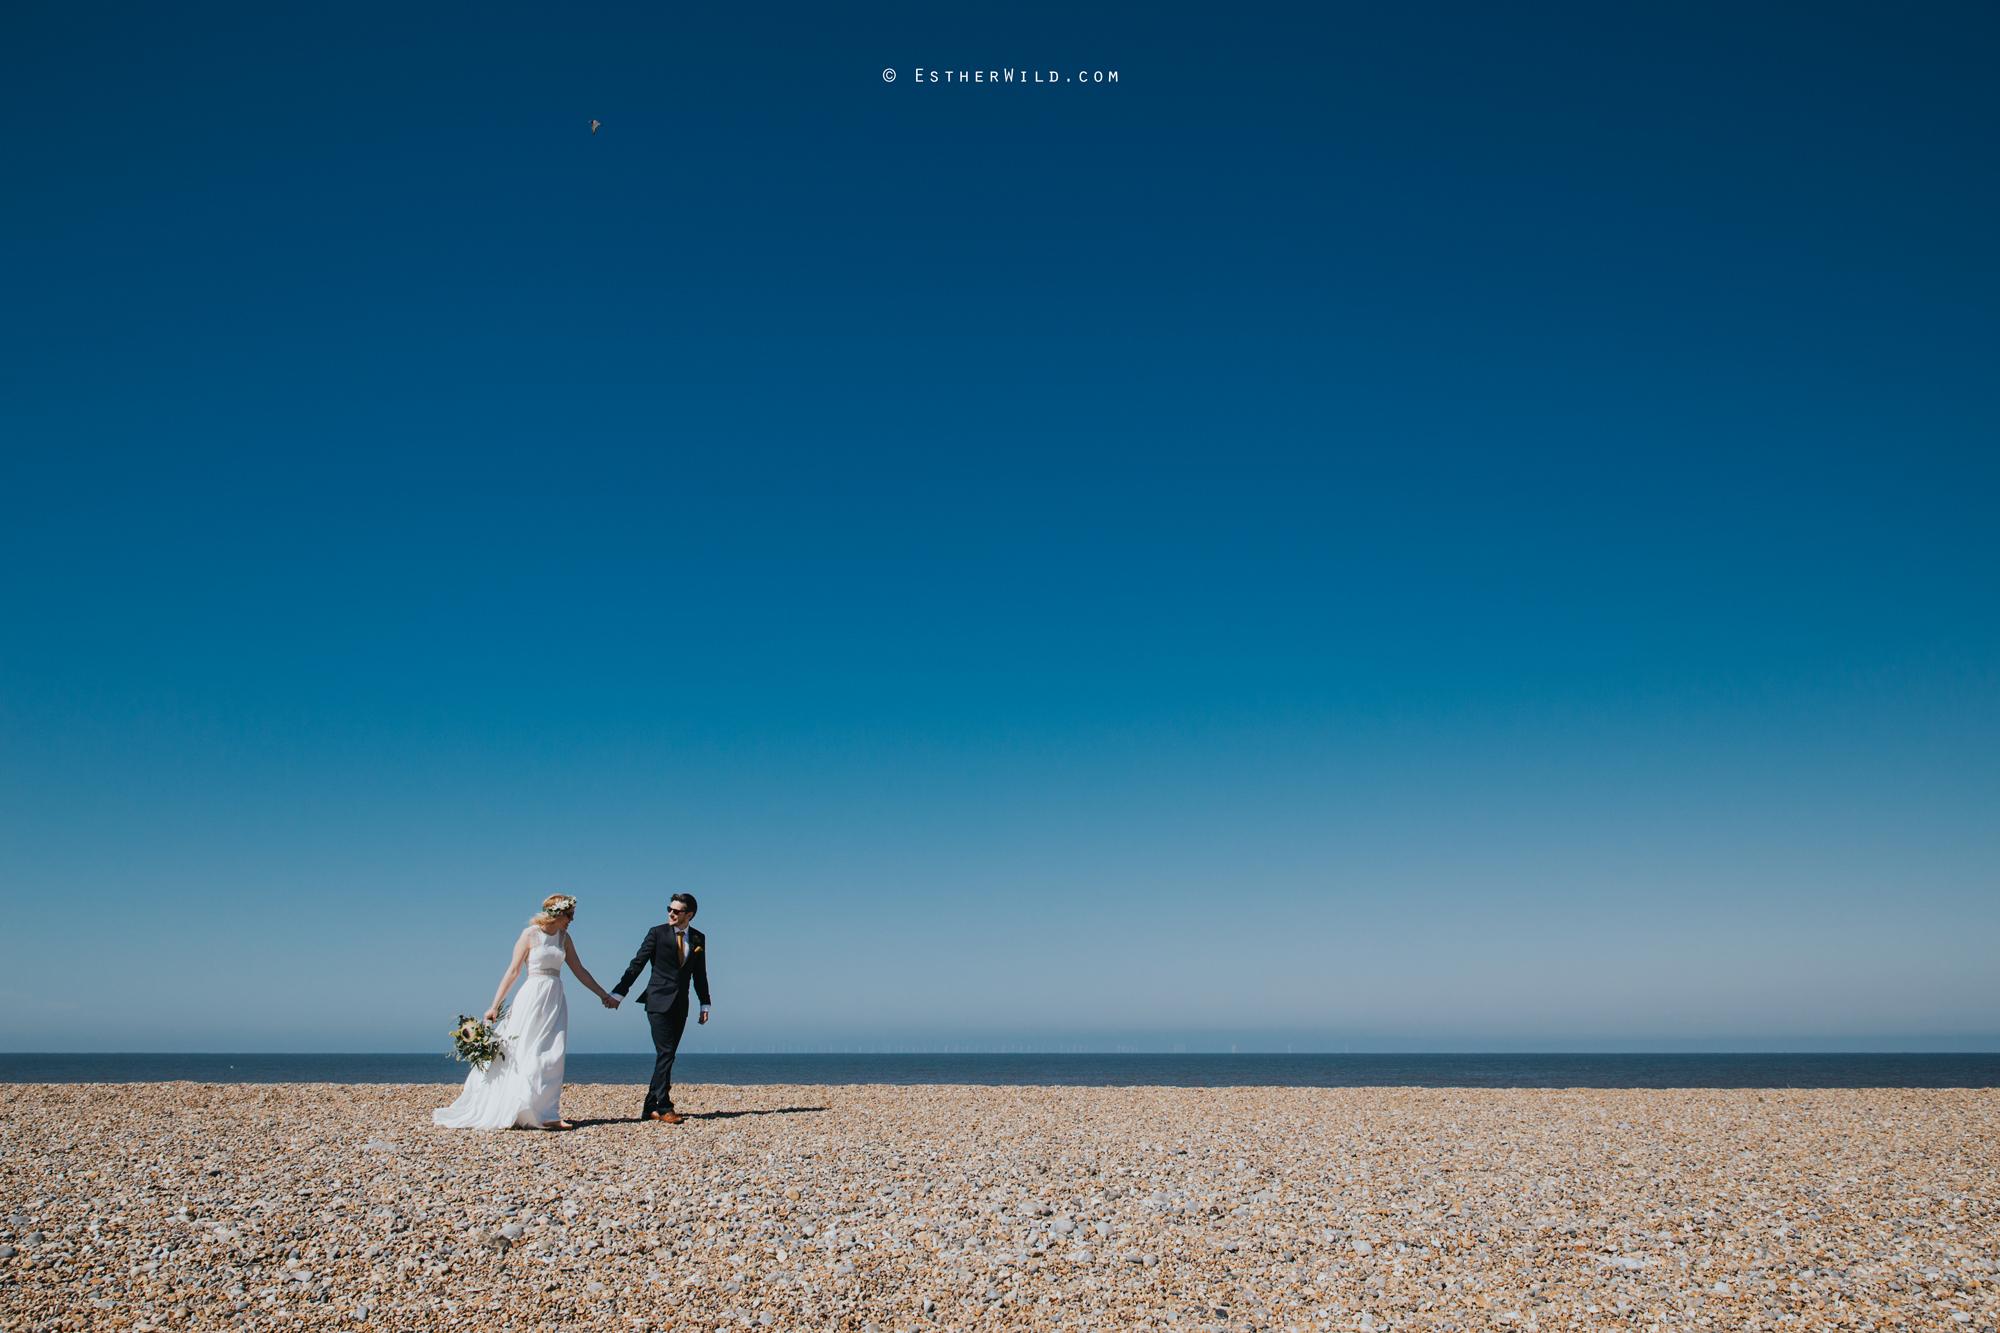 IMG_1244Cley_Barn_Drift_Norfolk_Coast_Wedding_Copyright_Esther_Wild_Photographer_.jpg